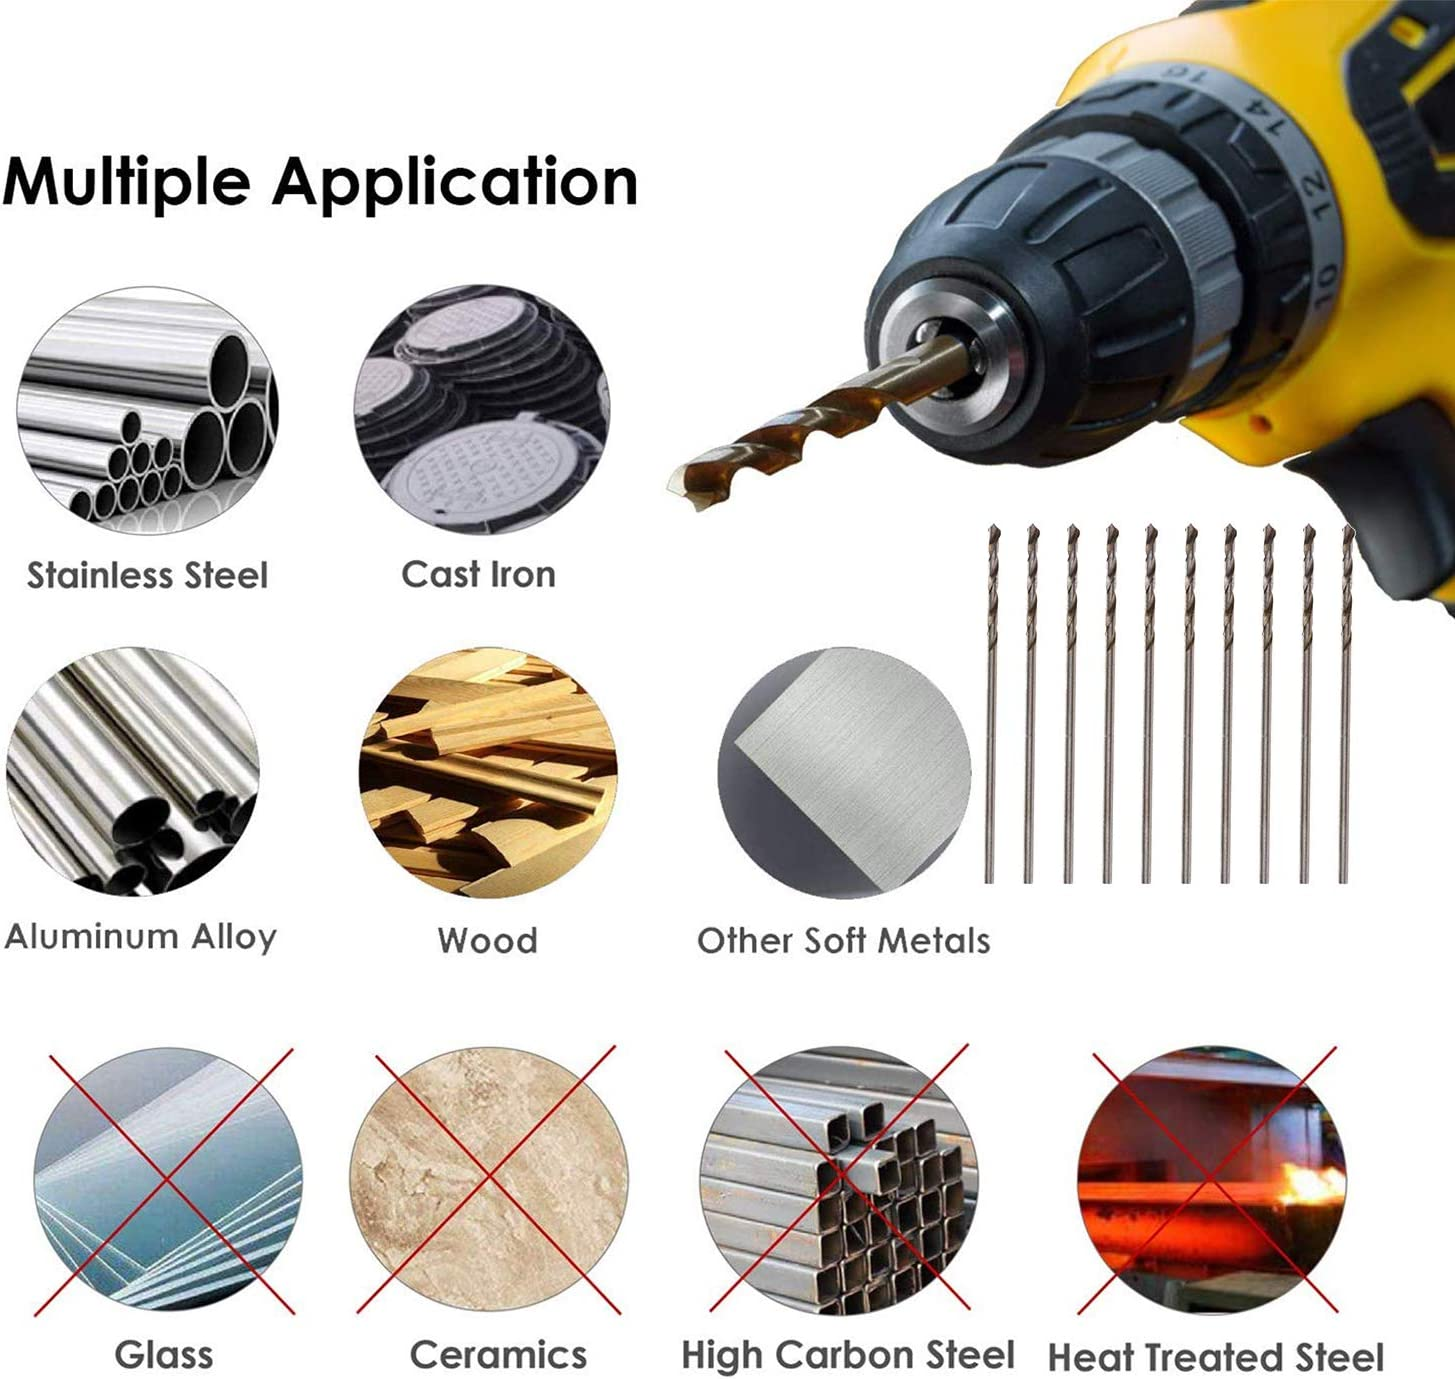 uxcell 10 Pcs Split Point High Speed Steel Fully Ground Micro Twist Drill Bits 1mm